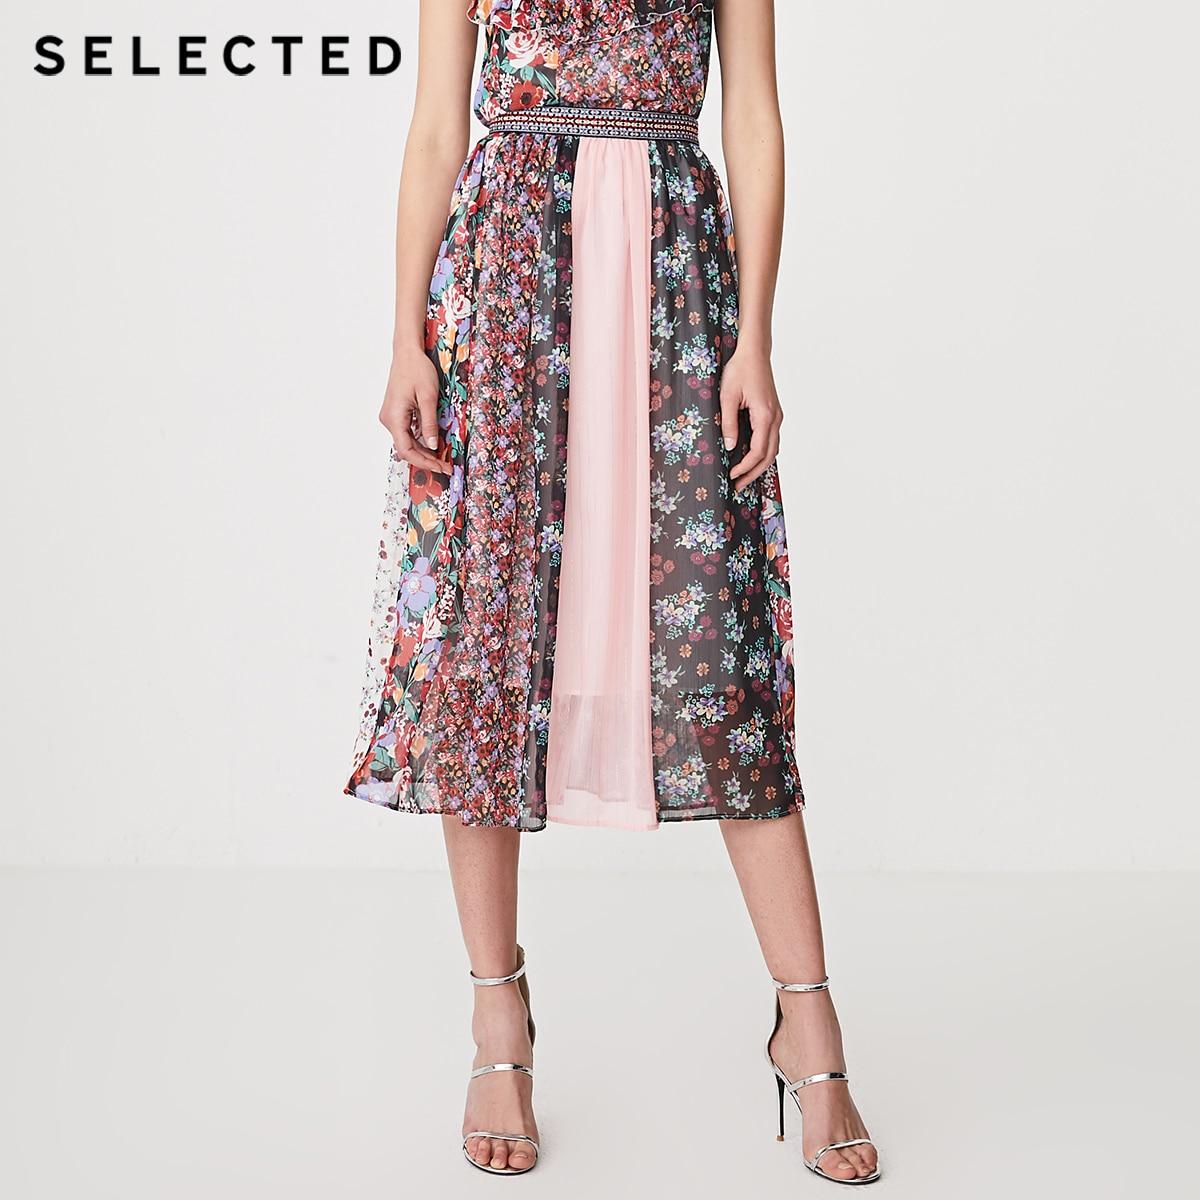 SELECTED Women's Printed Business Commuter Spliced Long Skirt S | 41924C524